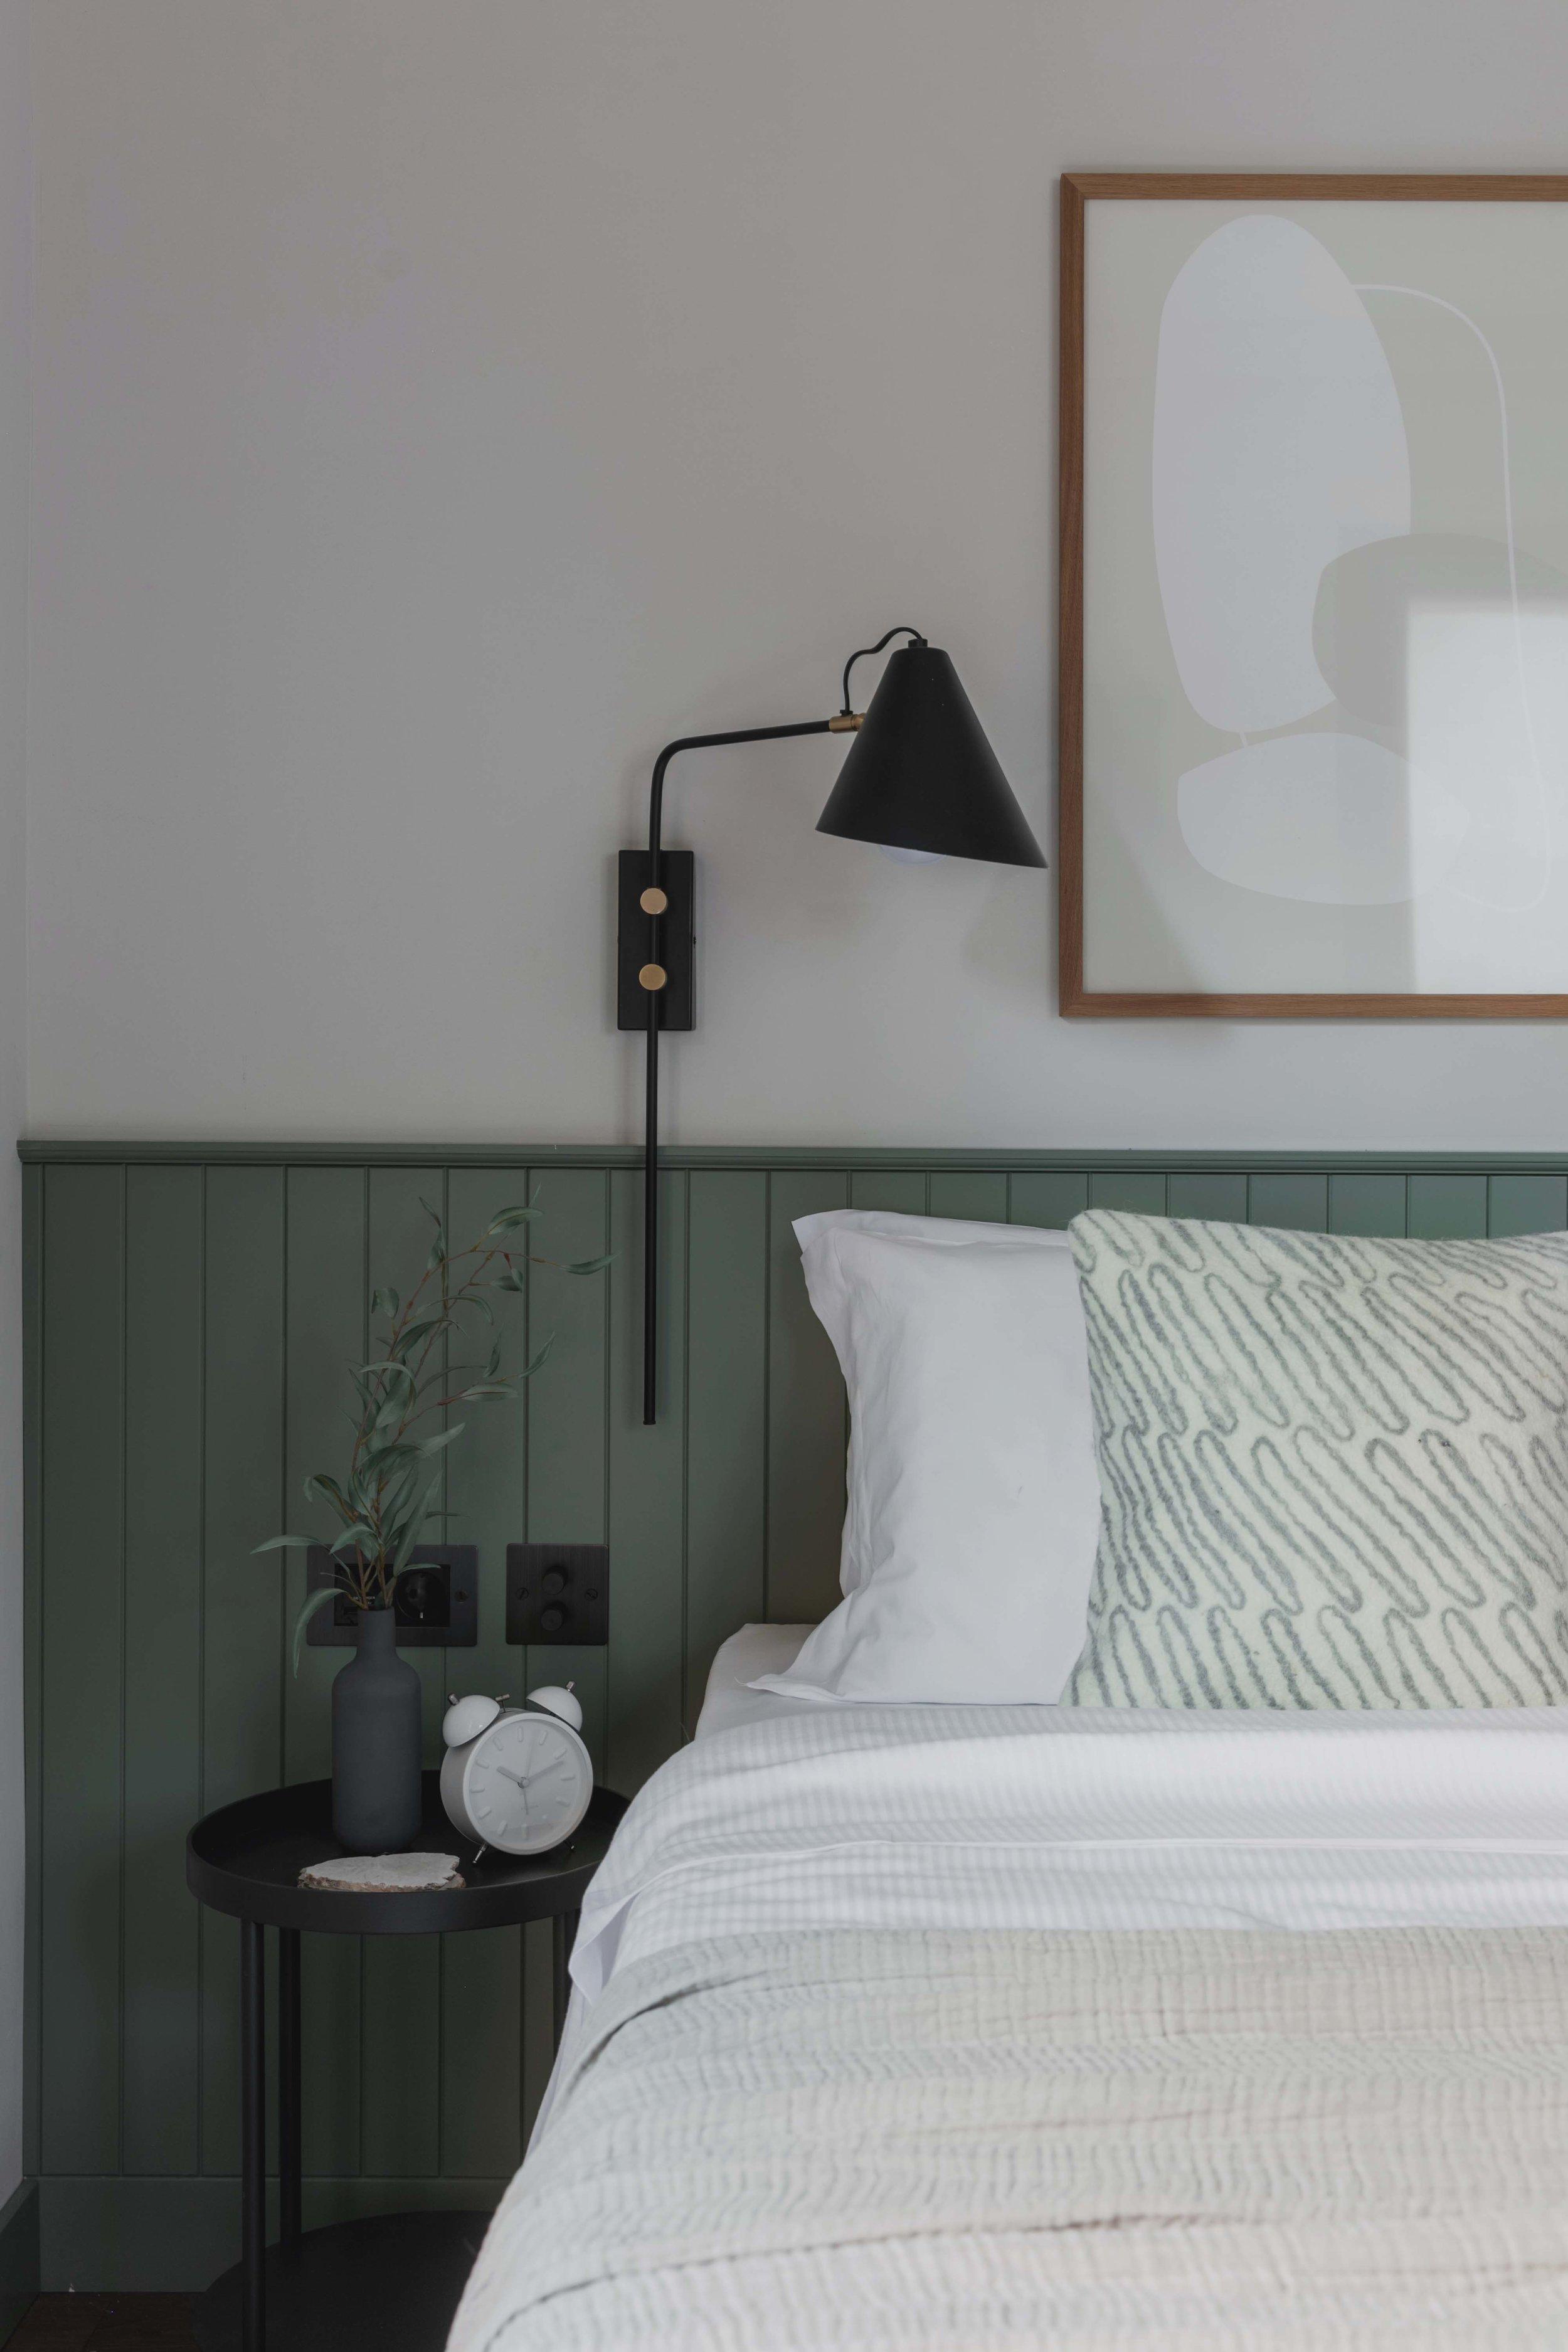 Miramonti_Boxx_Creative_Interior_Design_Hotel_Room.jpg